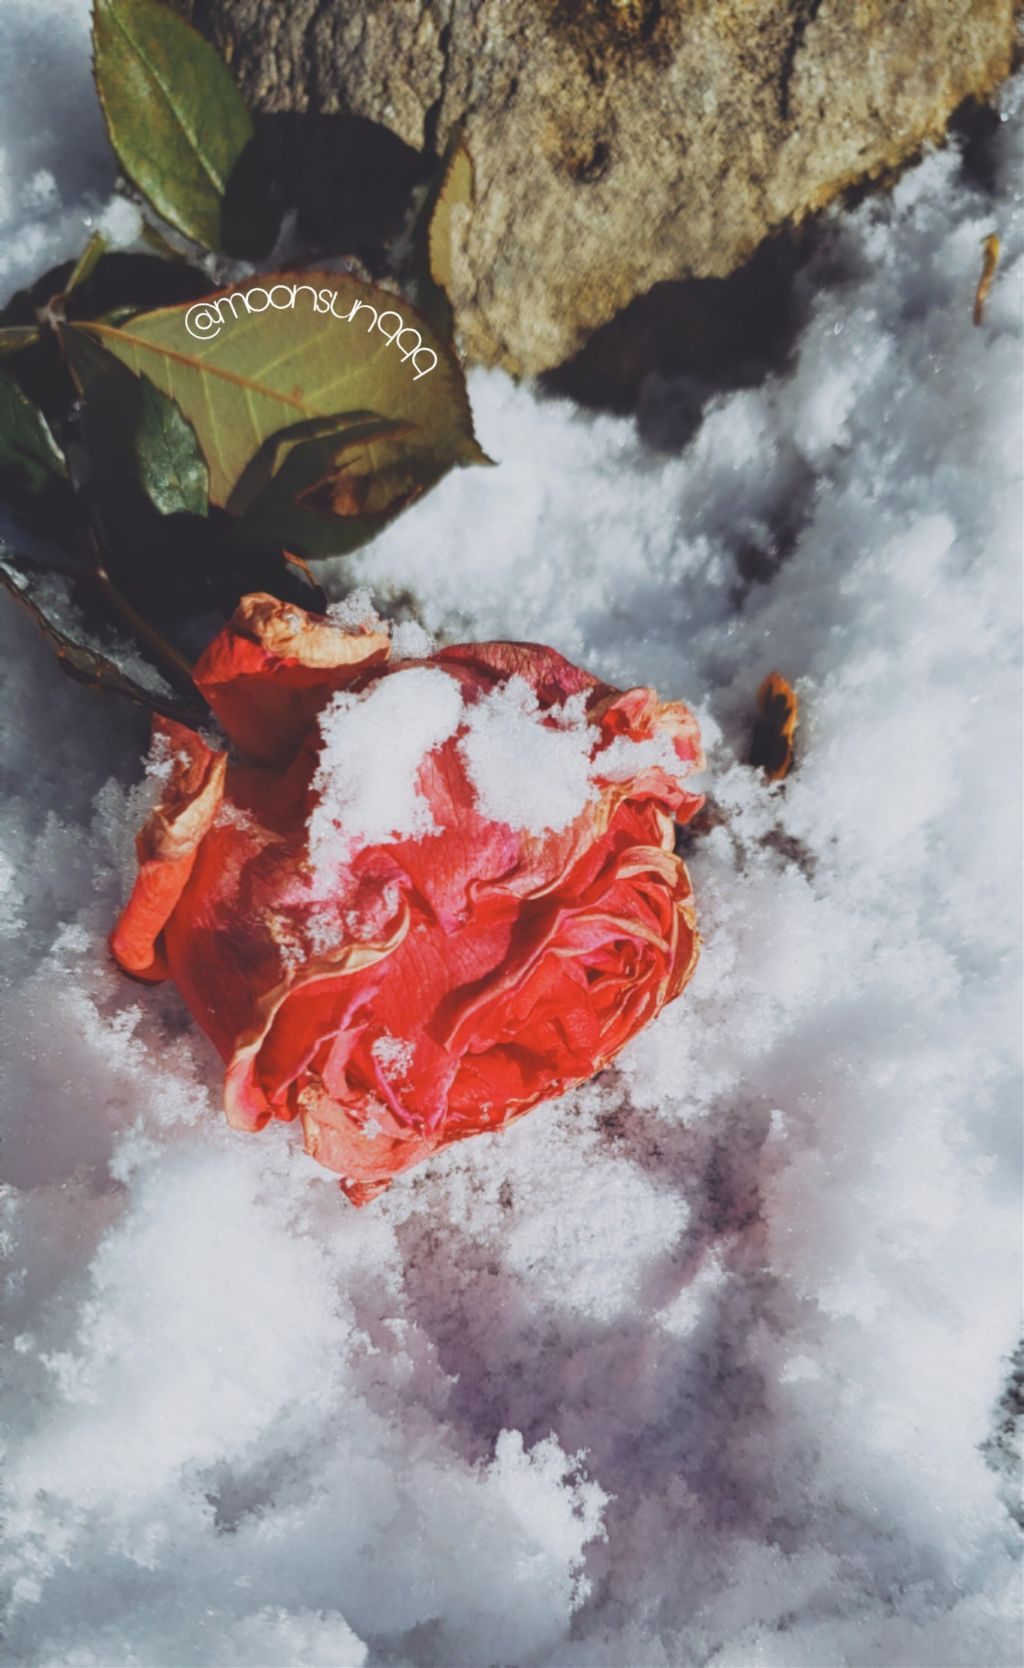 #freetoedit #frozen #rose #snow #photography #myclick